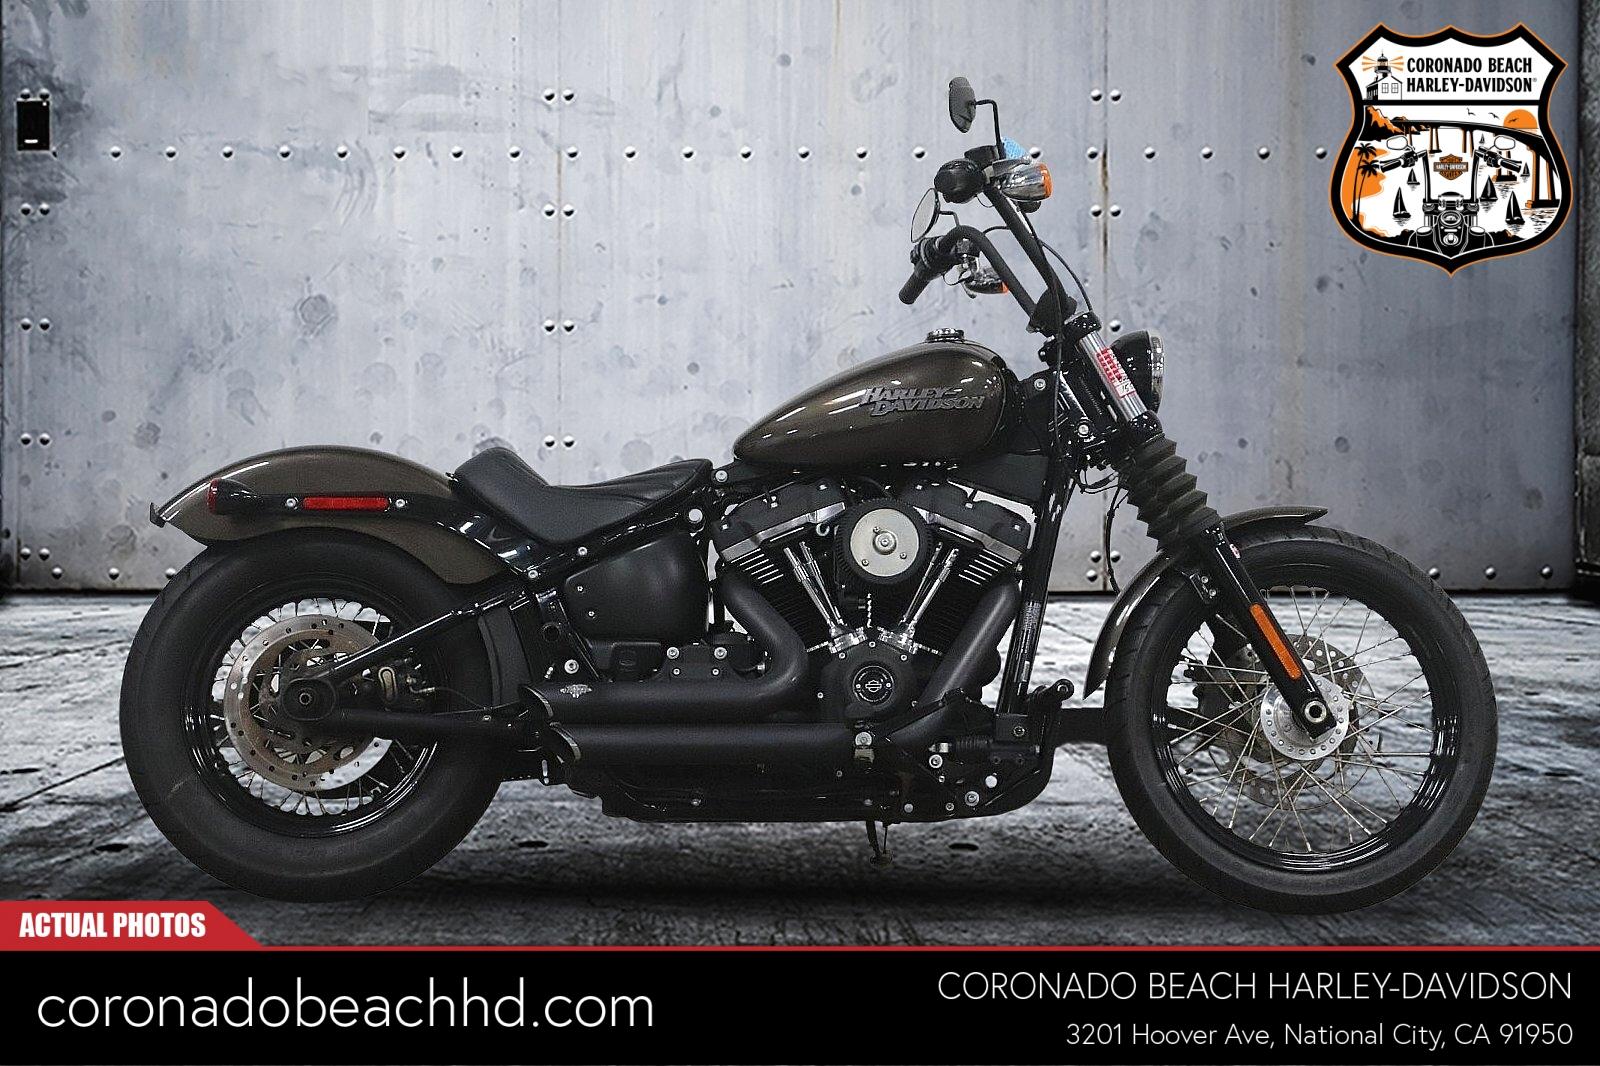 2020 Harley-Davidson Street Bob [84]